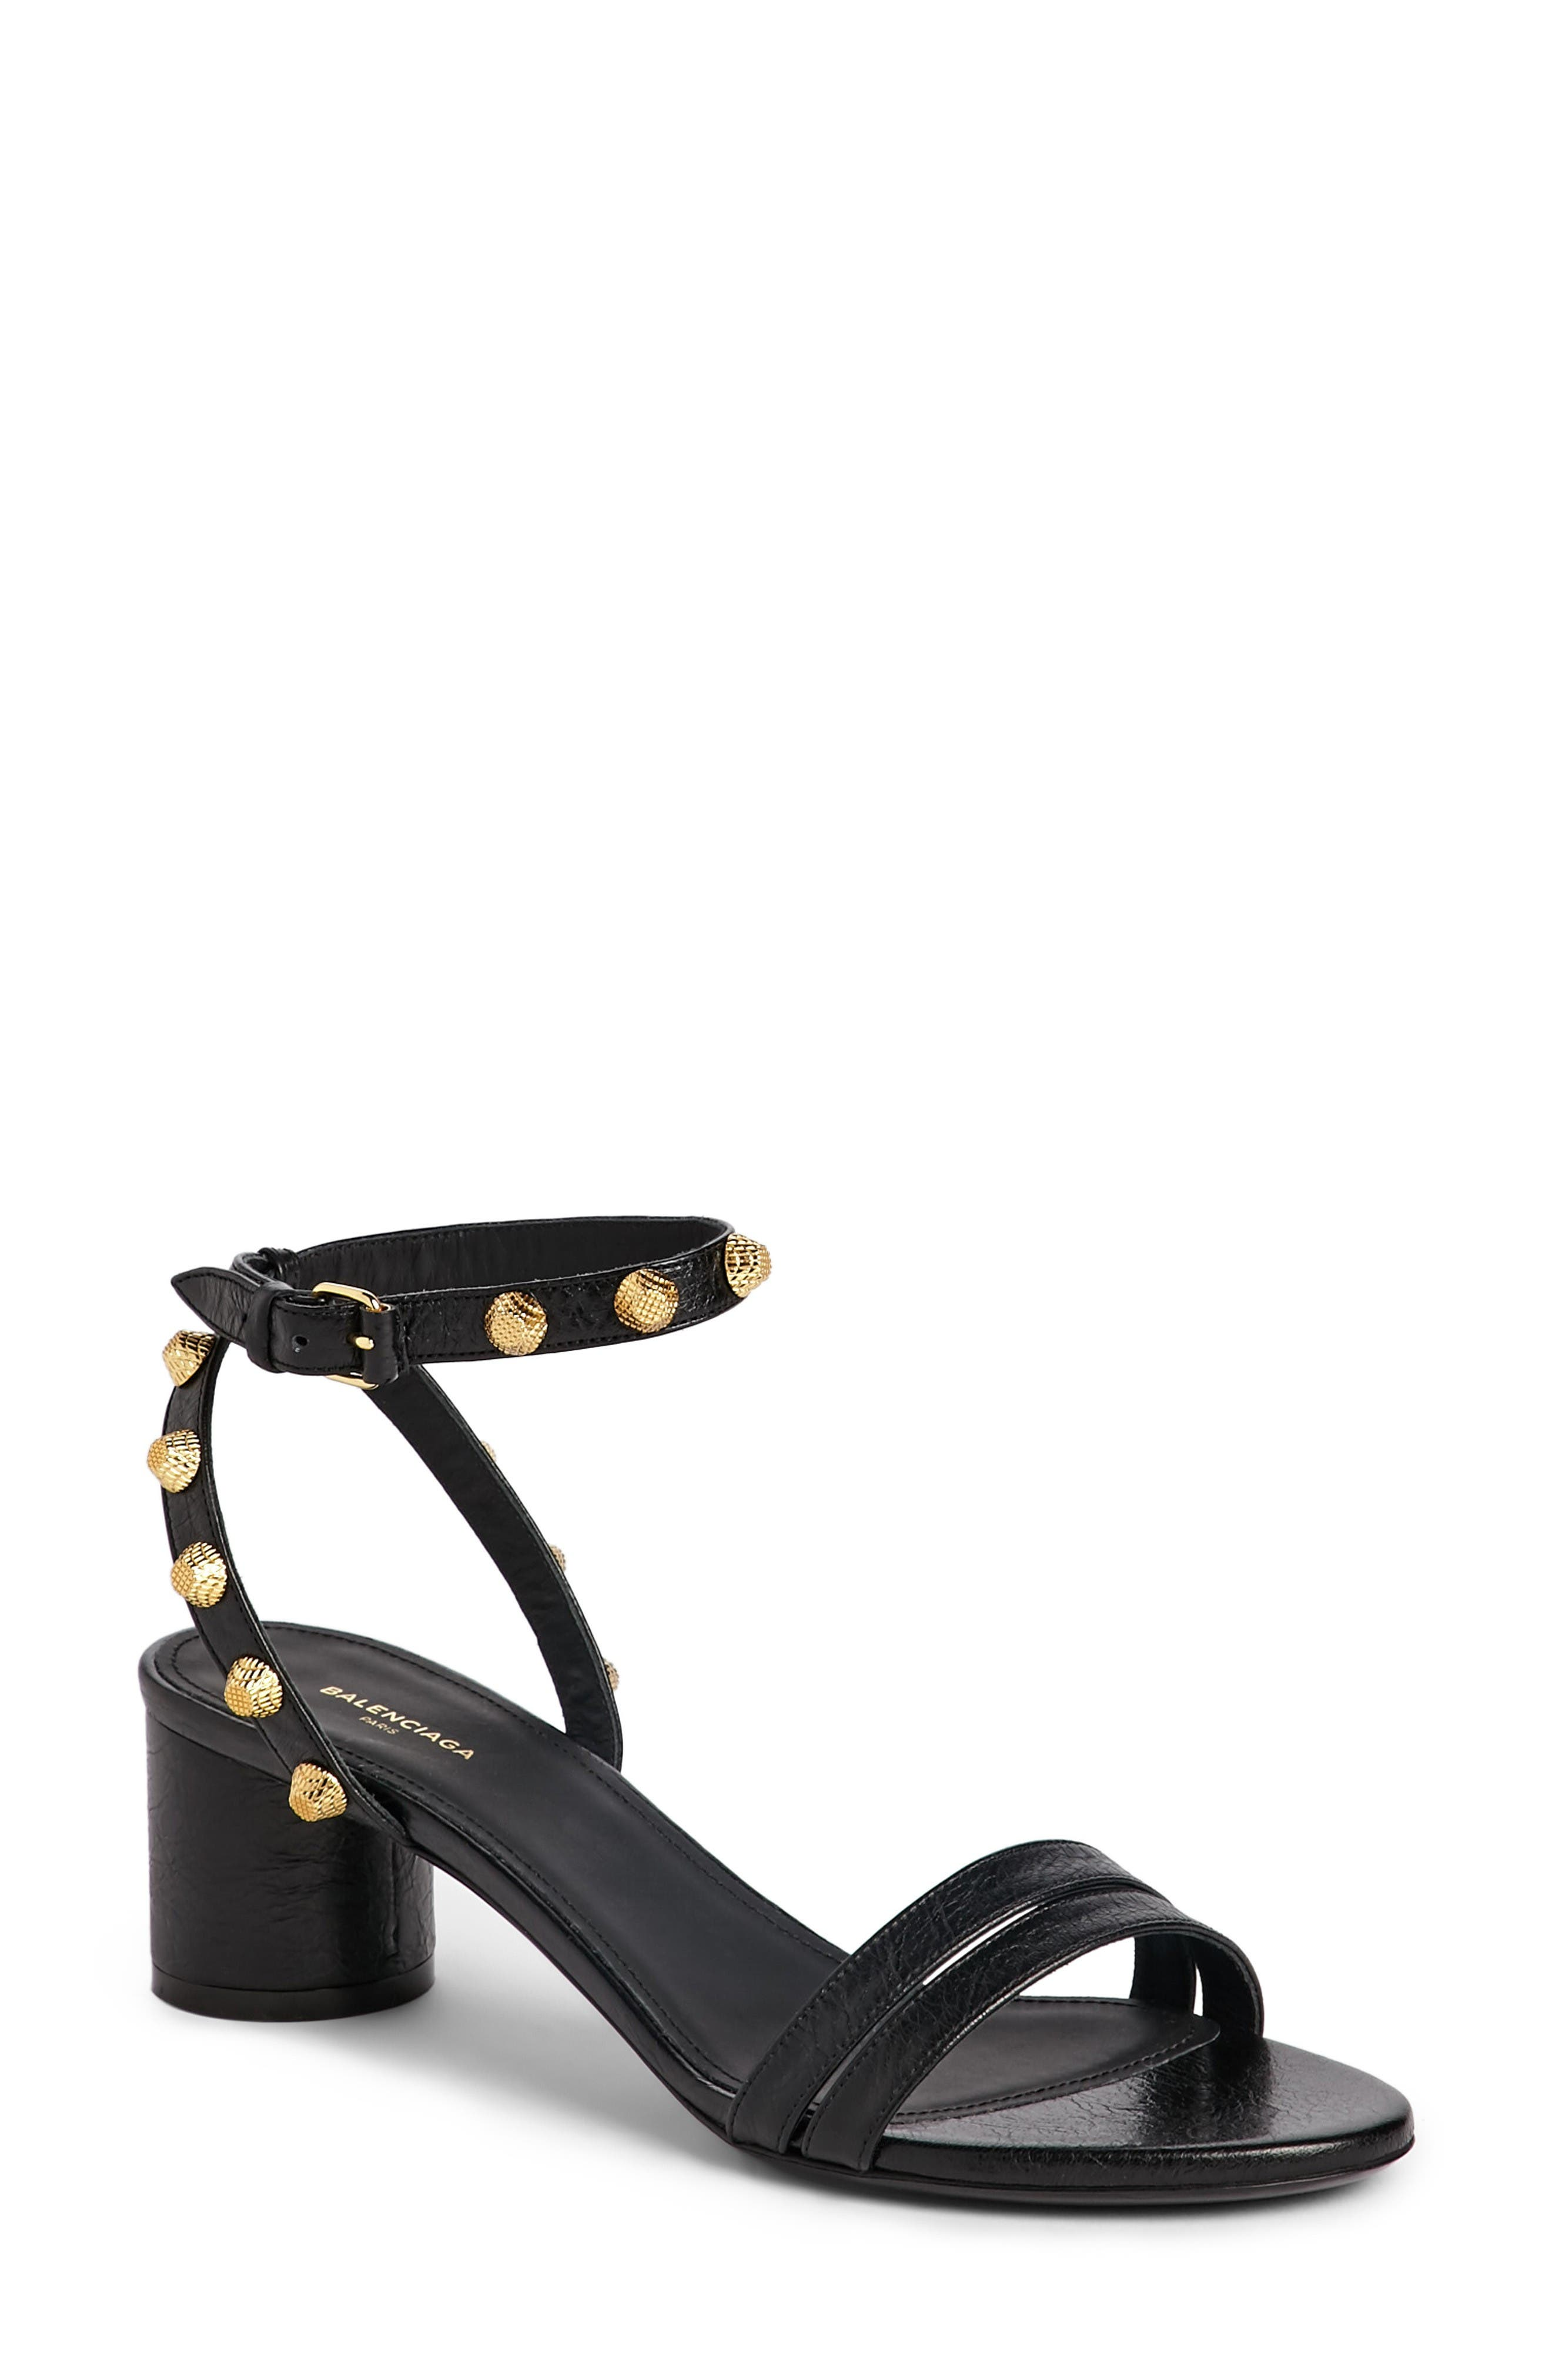 Alternate Image 1 Selected - Balenciaga Studded Ankle Strap Sandal